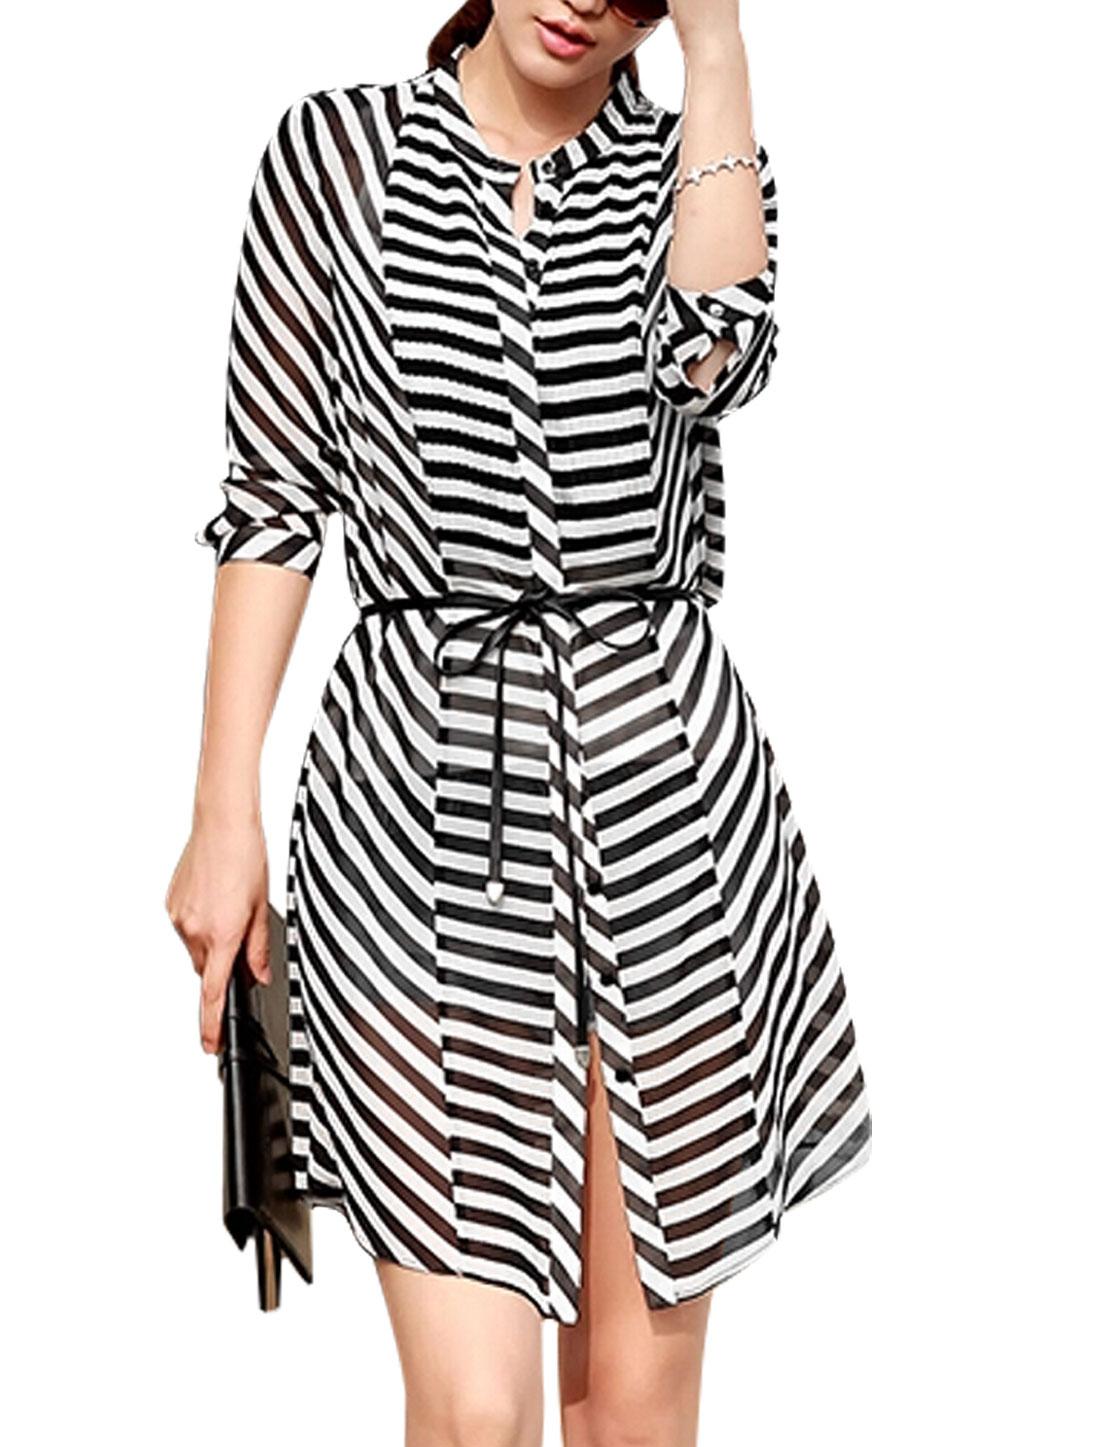 Lady 3/4 Sleeve Stripes Pattern Semi Sheer Chiffon Shirt w Waist String S